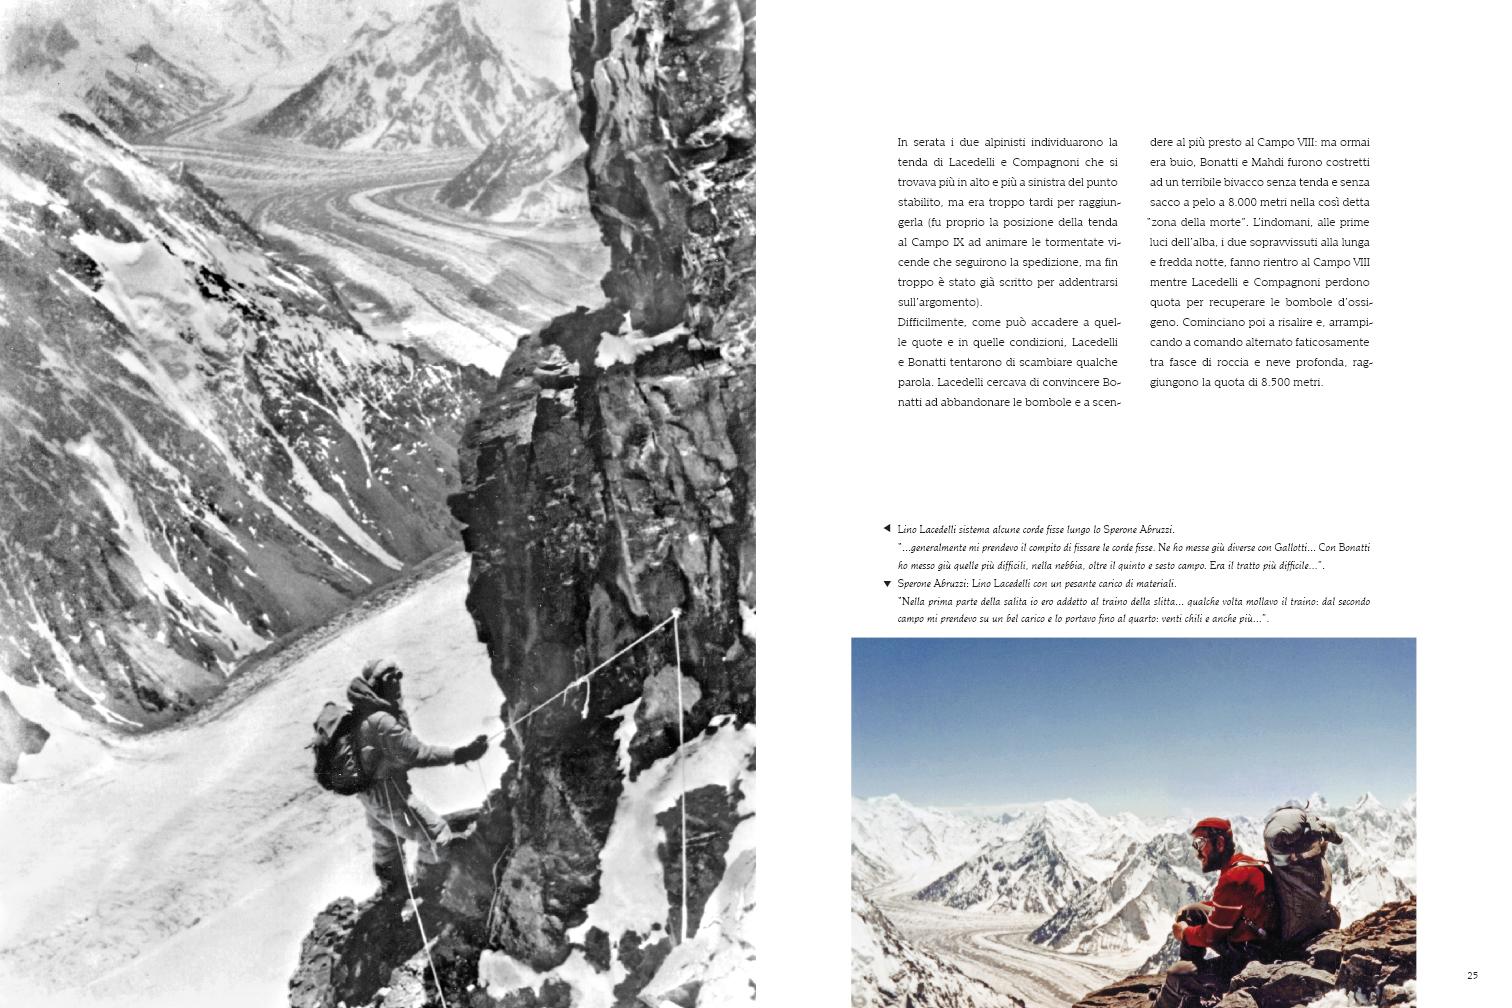 K2 EXPEDITION 1954-2004 Giuseppe Ghedina Fotografo - 014.jpg